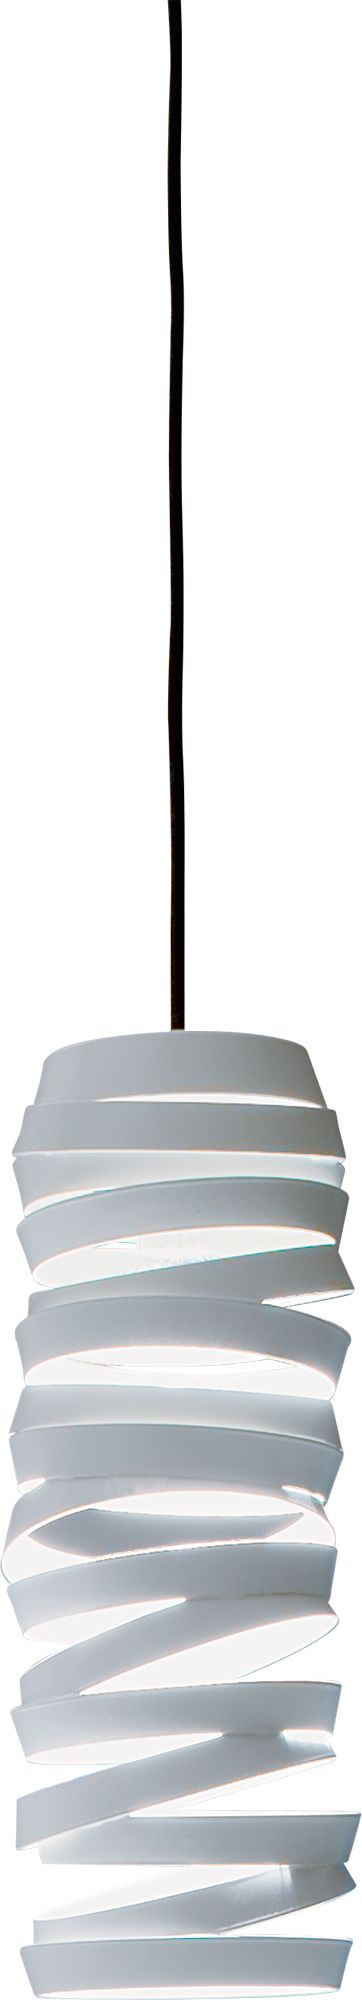 Amourette Pendant by Studio Italia Design on ECC